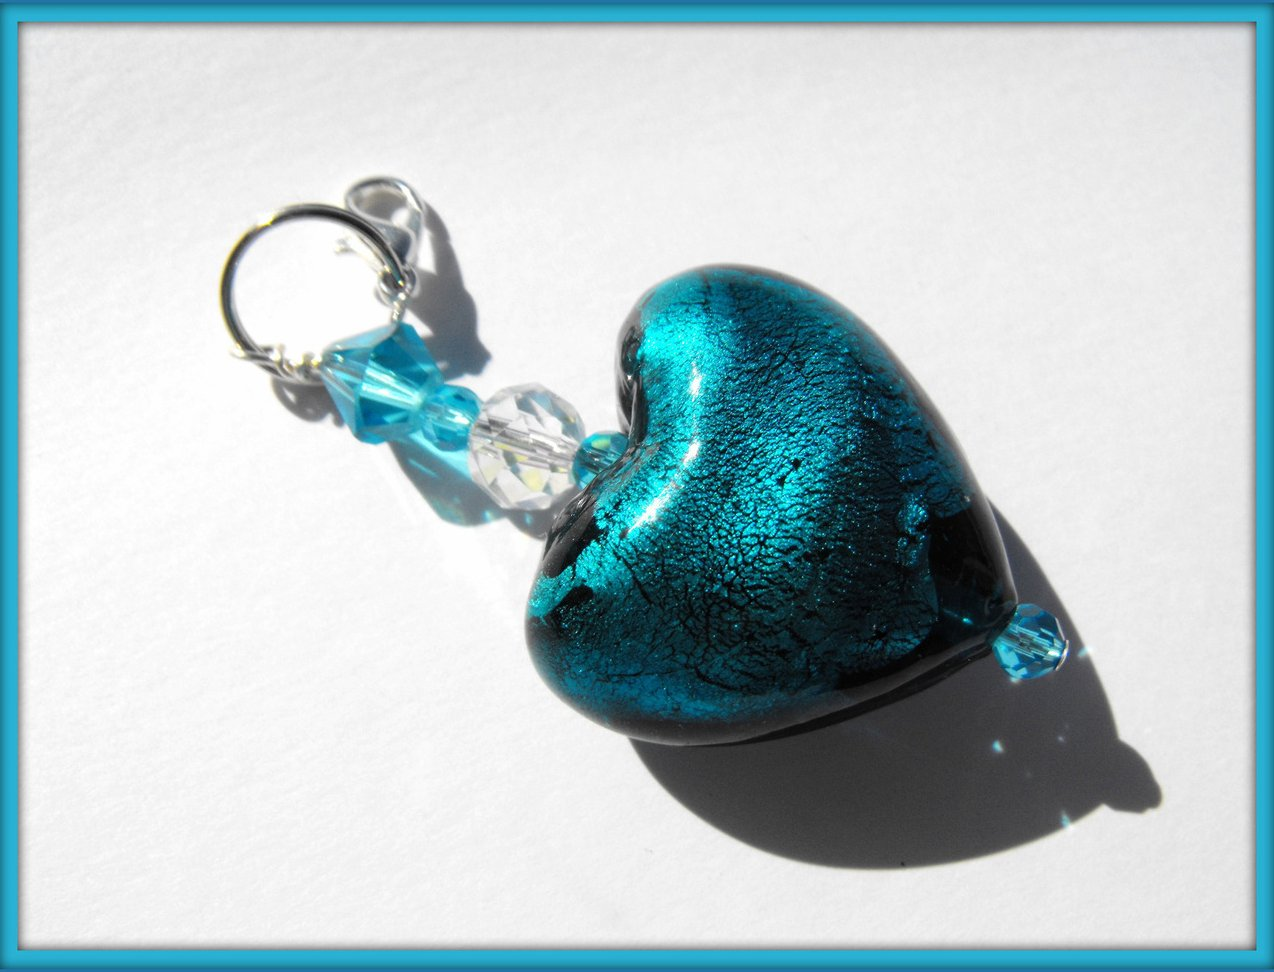 Beaded Purse Charm Zipper Pull Keychain Crystal Silver Teal